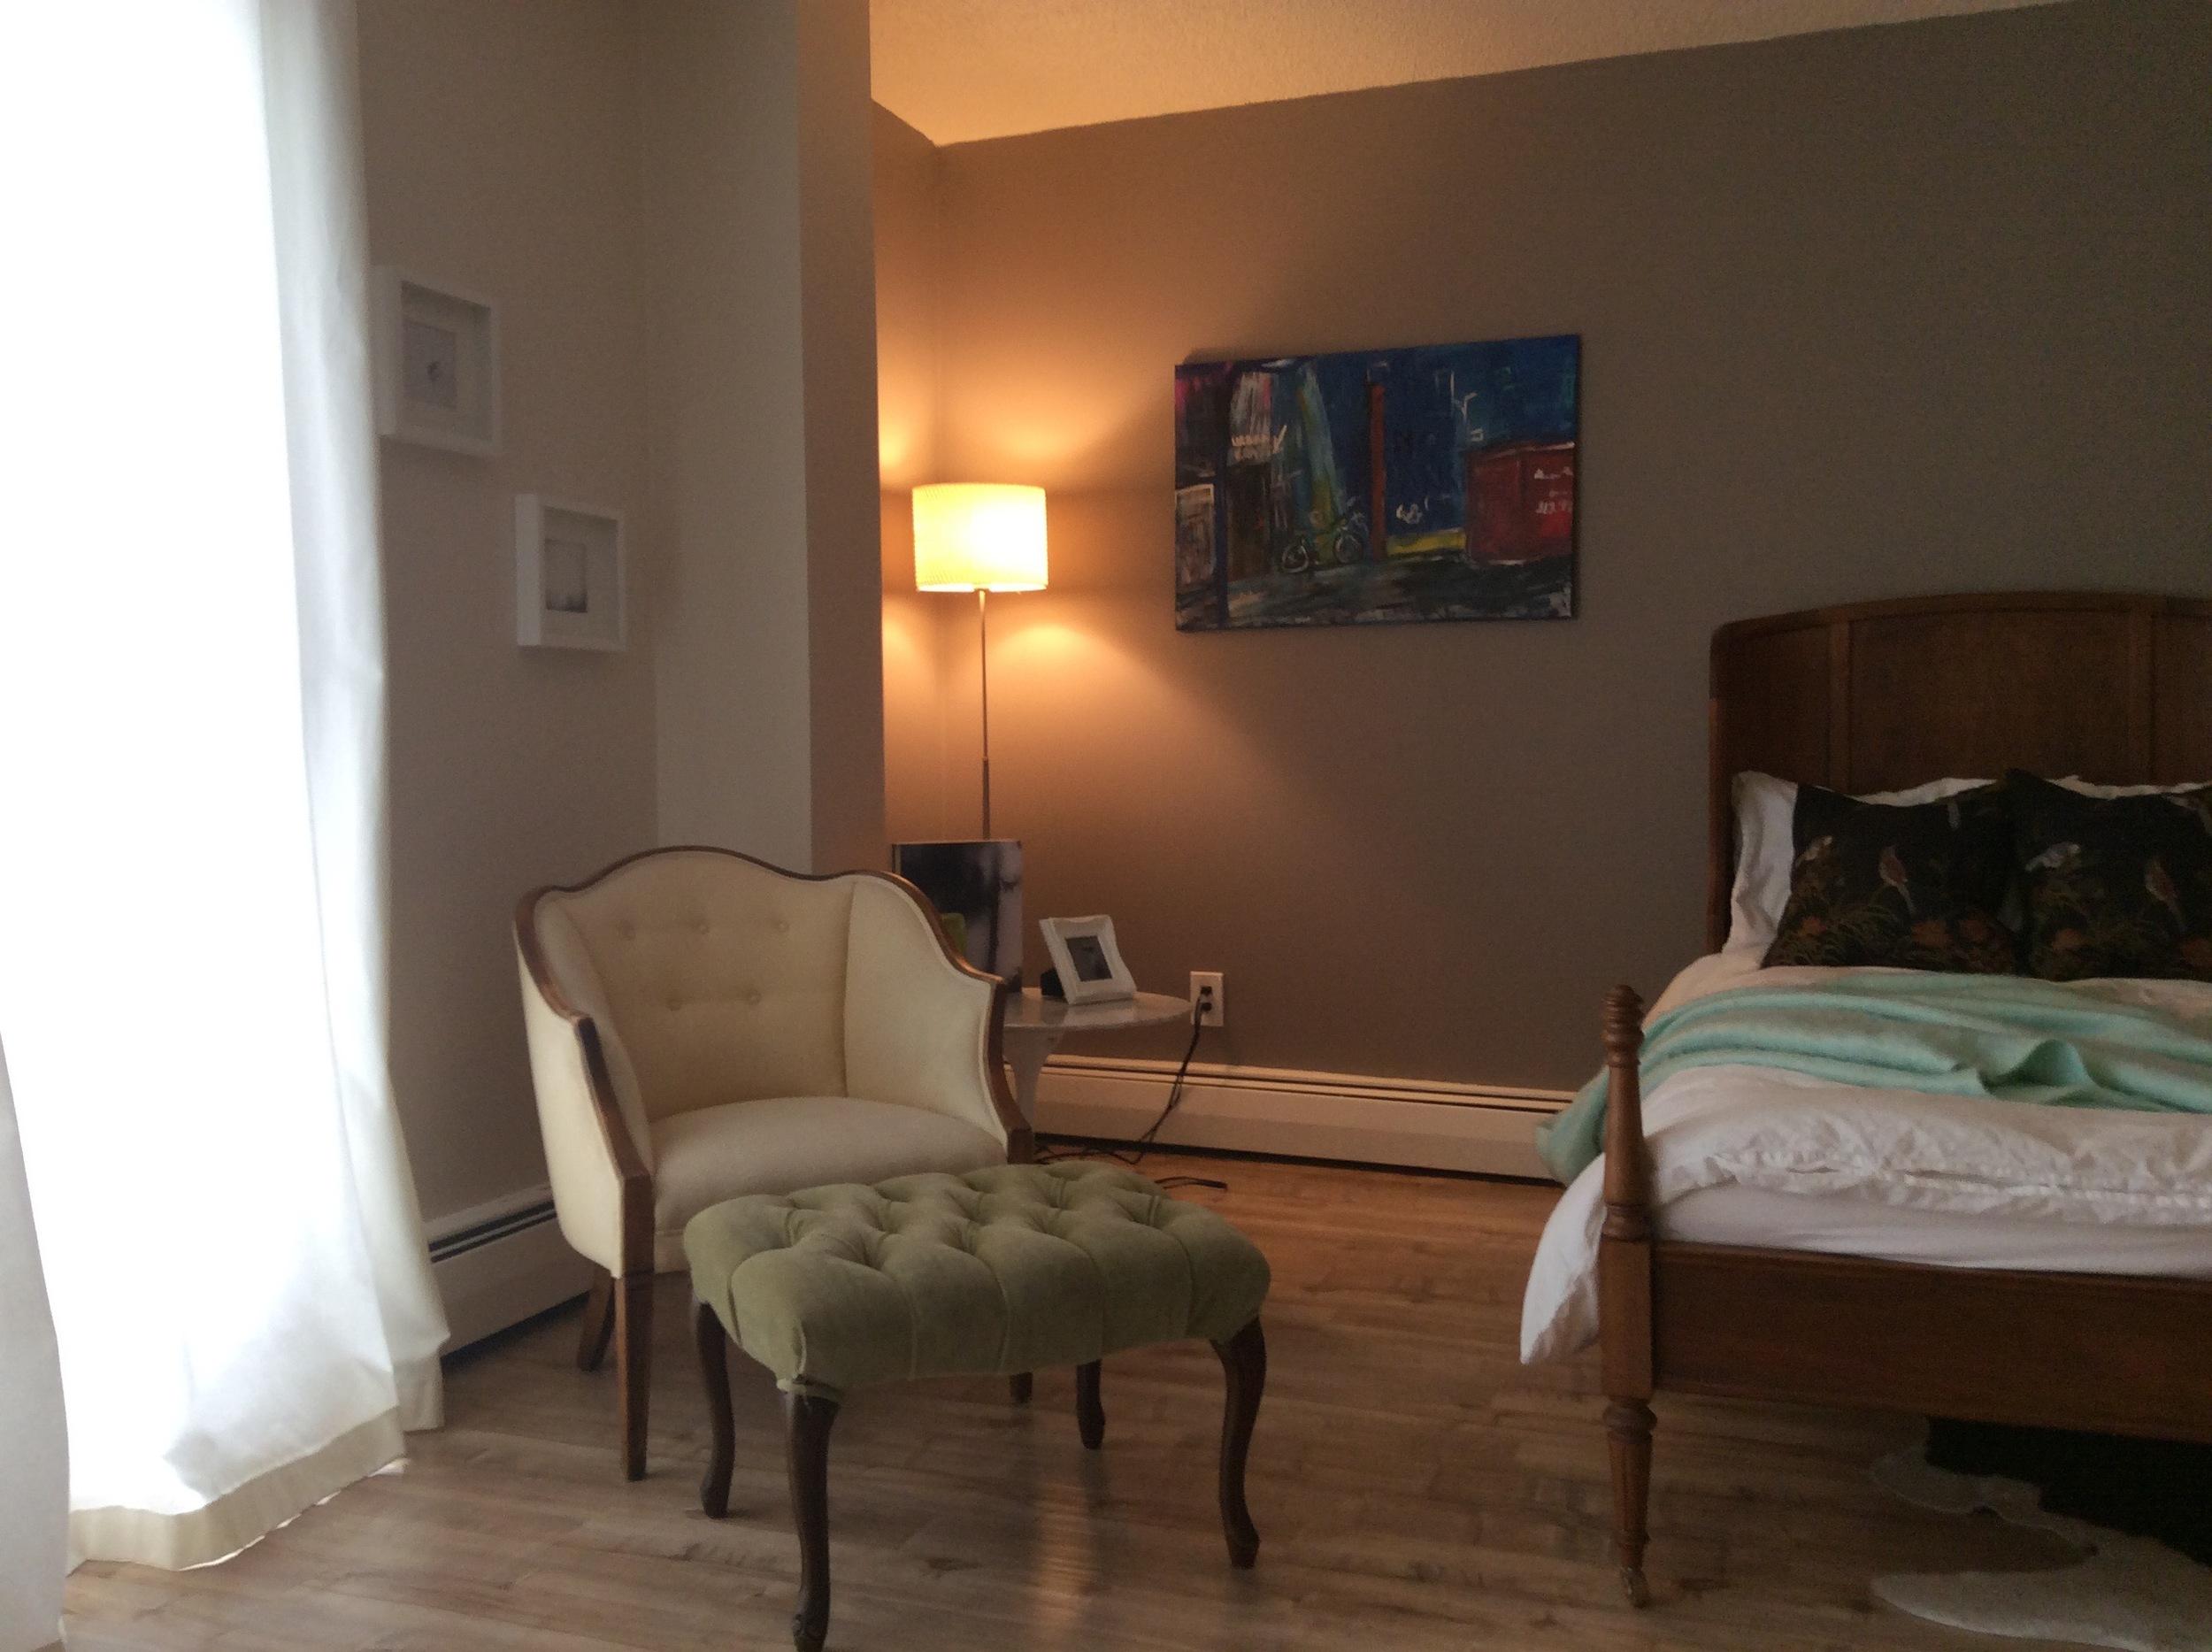 Inglewood+Condo+Living+Room+Art.jpg